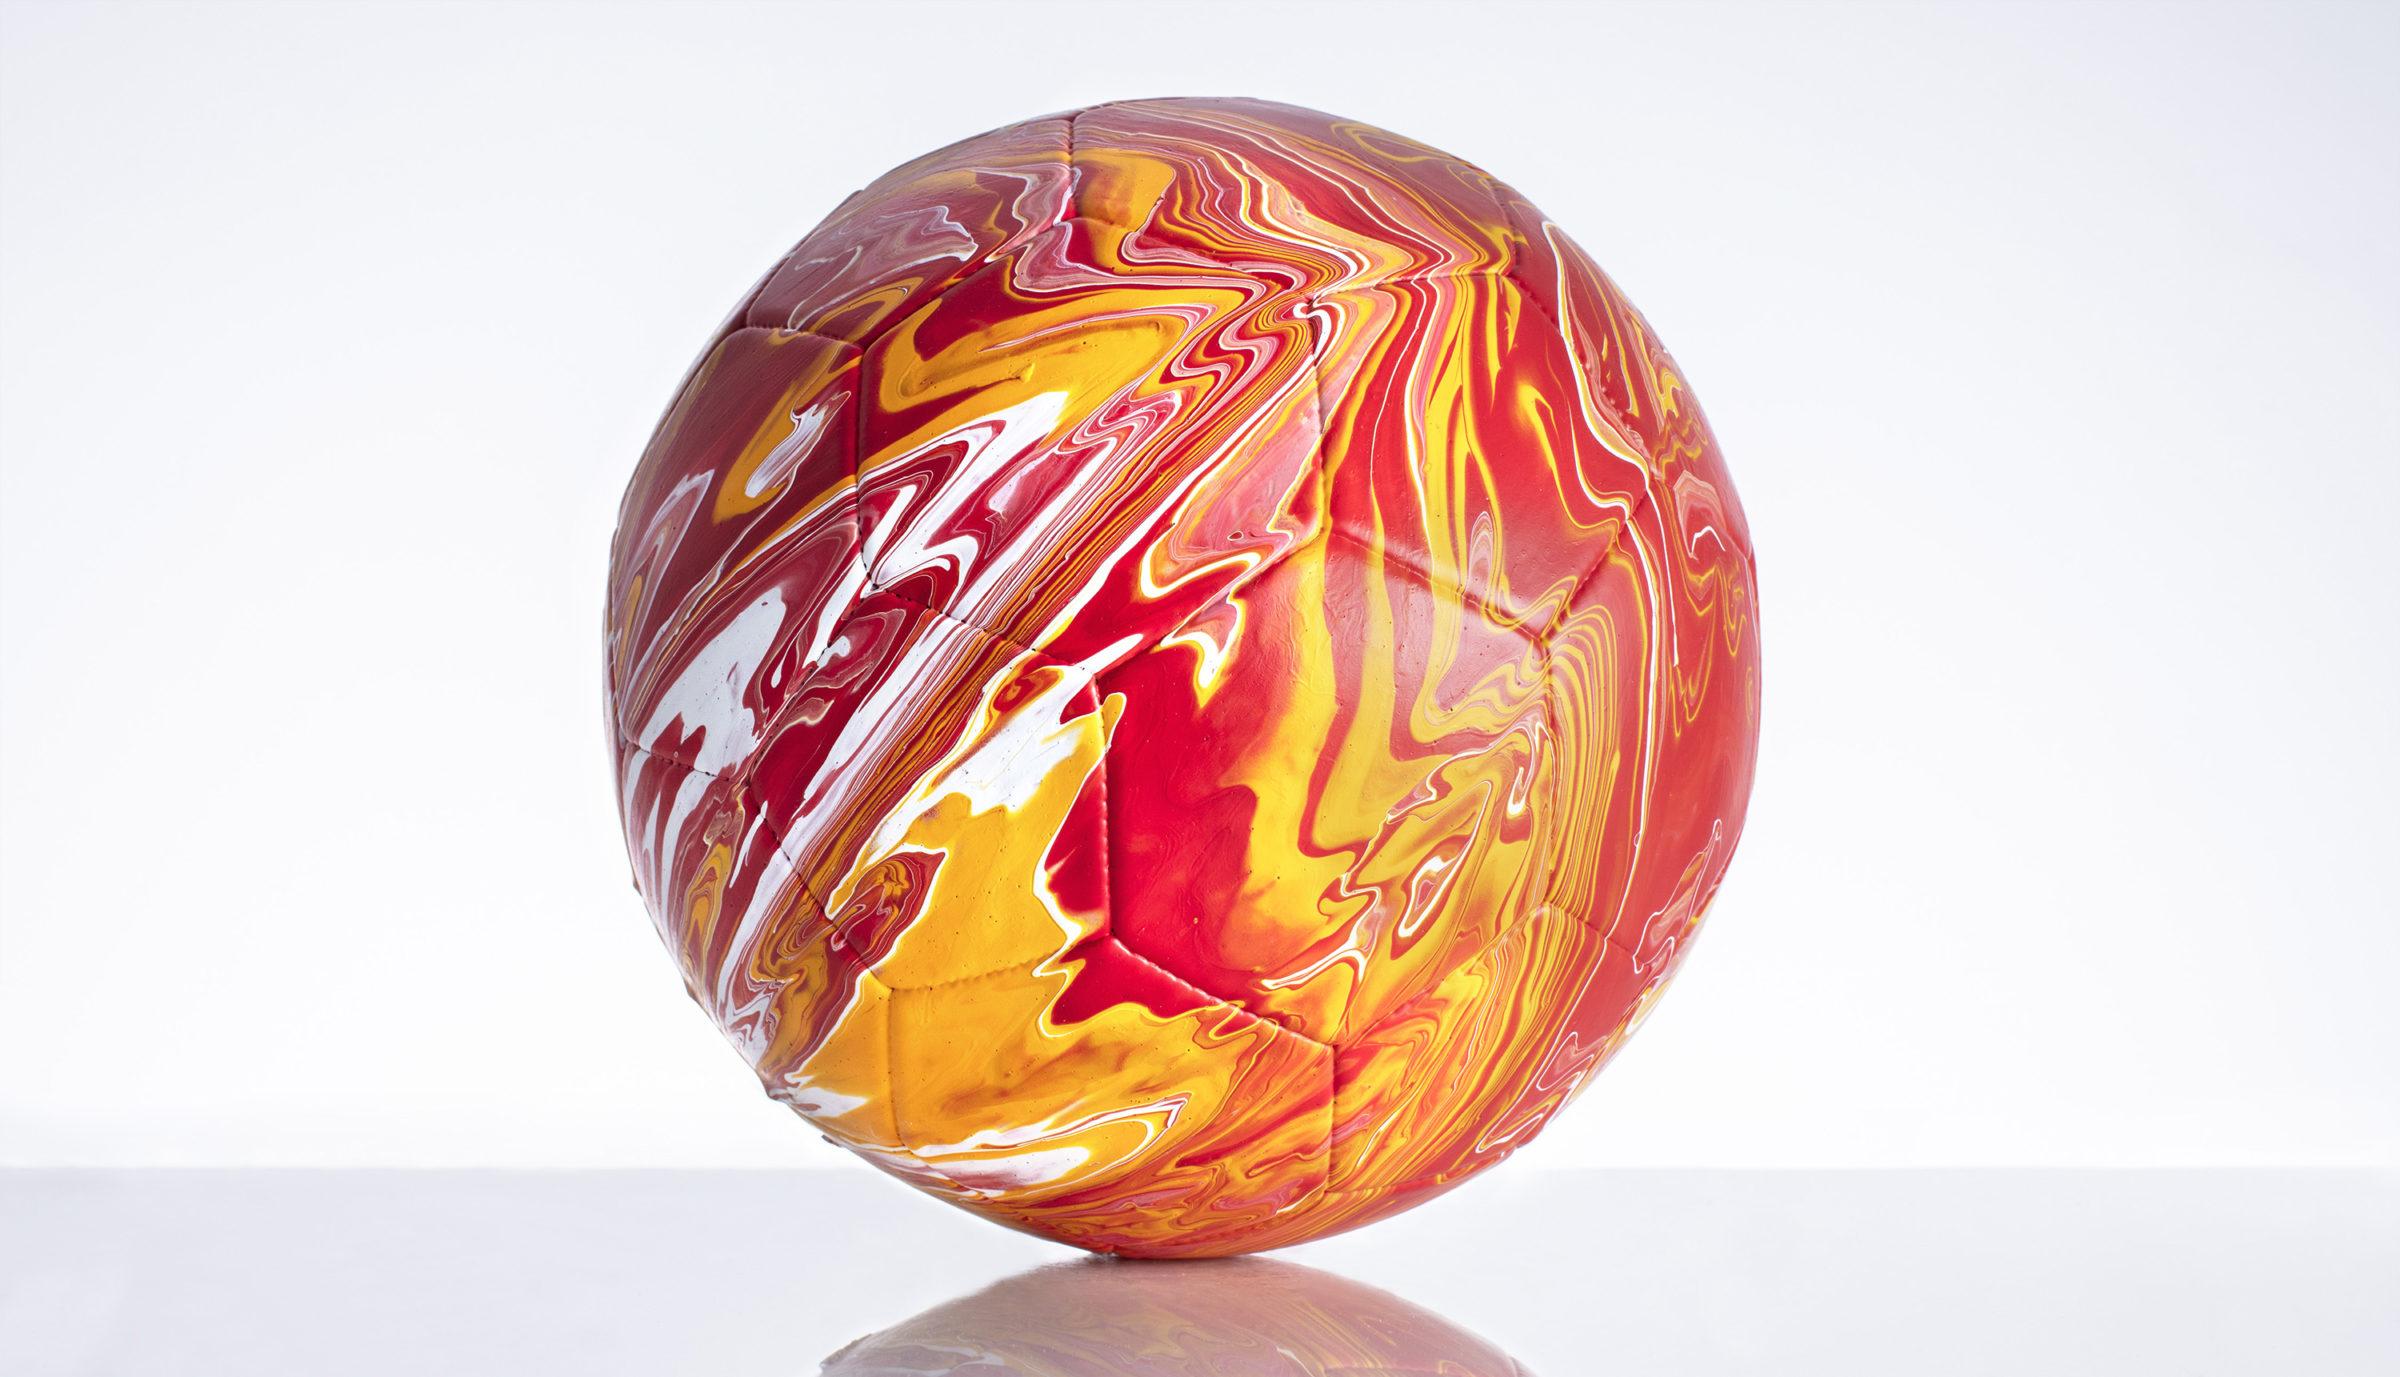 Craig Black x The Fusion Series Footballs Acrylic Fusion Football Art Installation 05 Spain